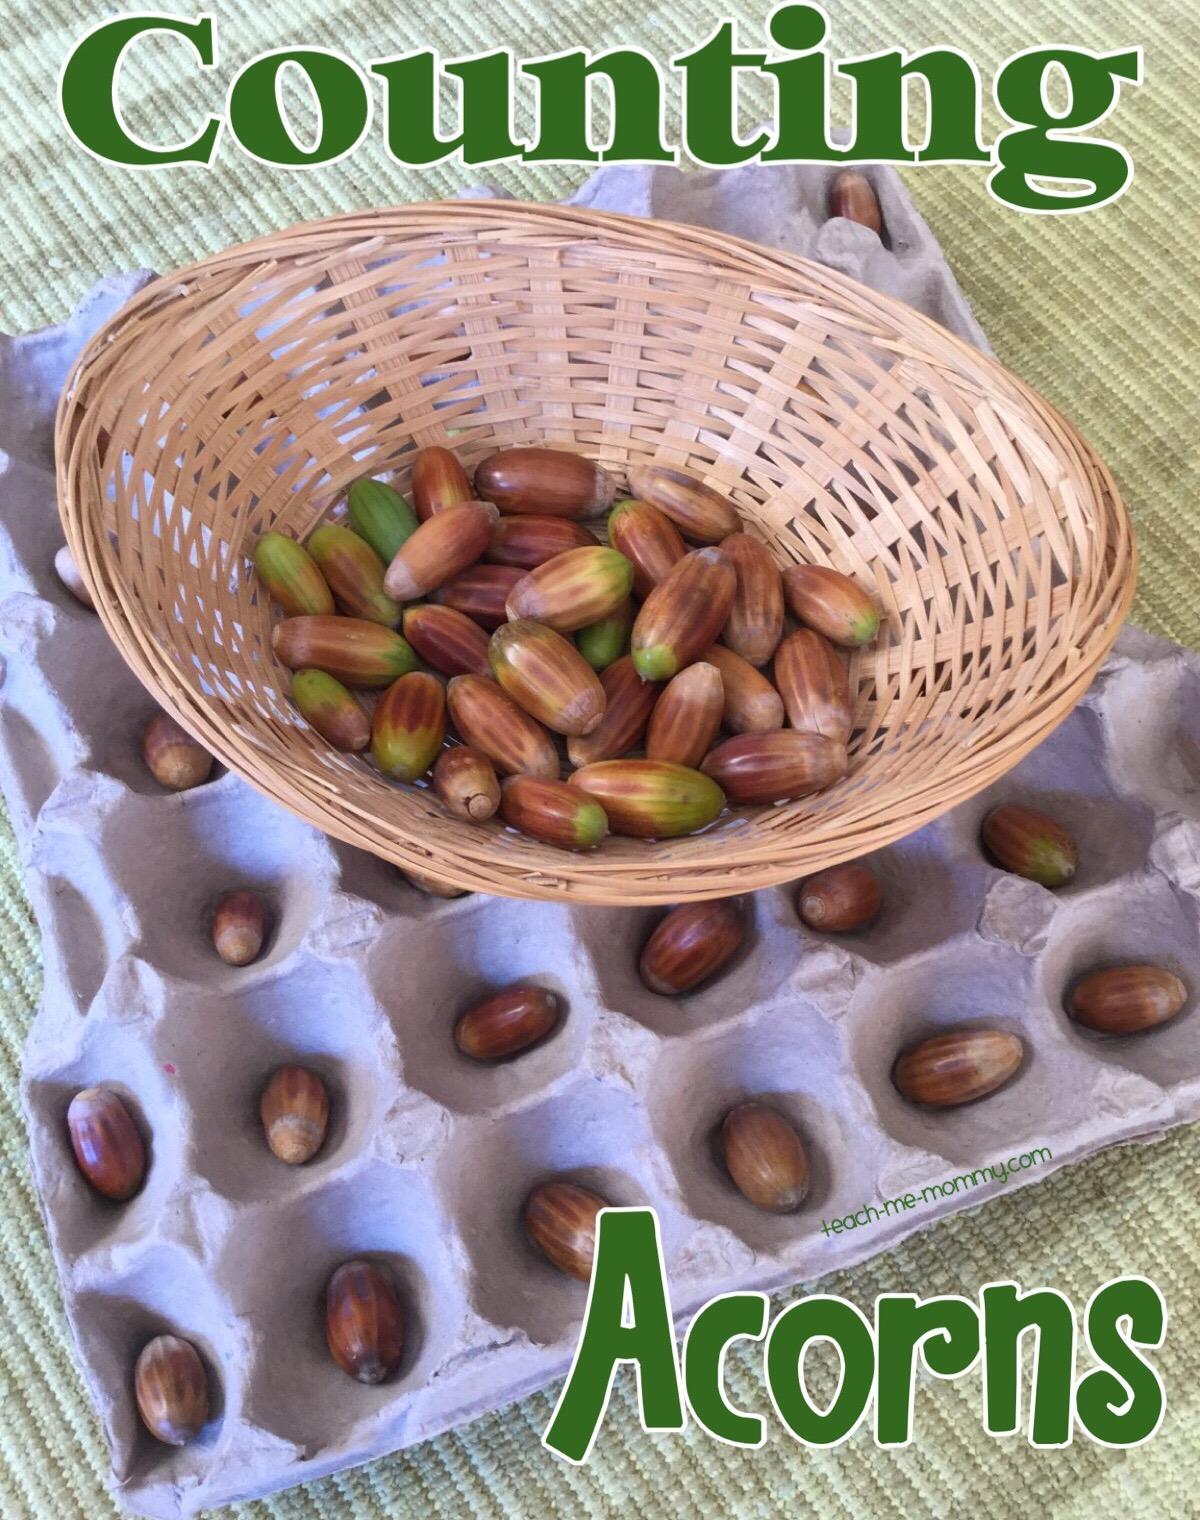 (counting acorns)